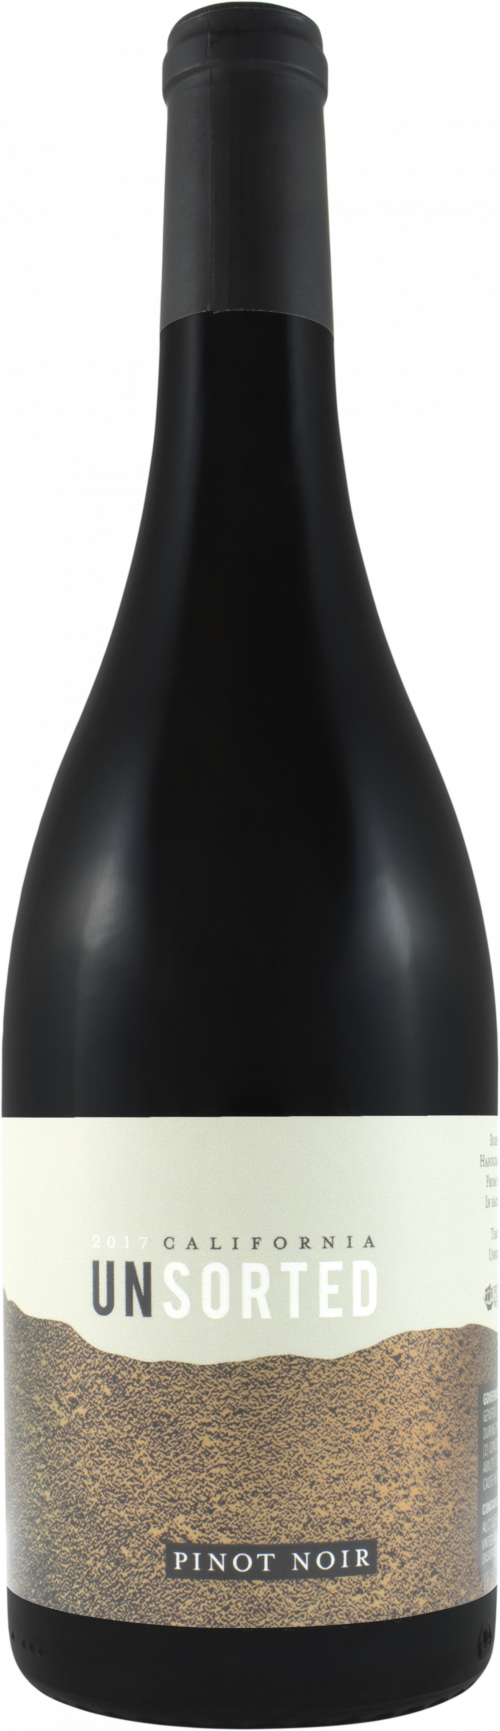 2018 Unsorted Pinot Noir 750ml